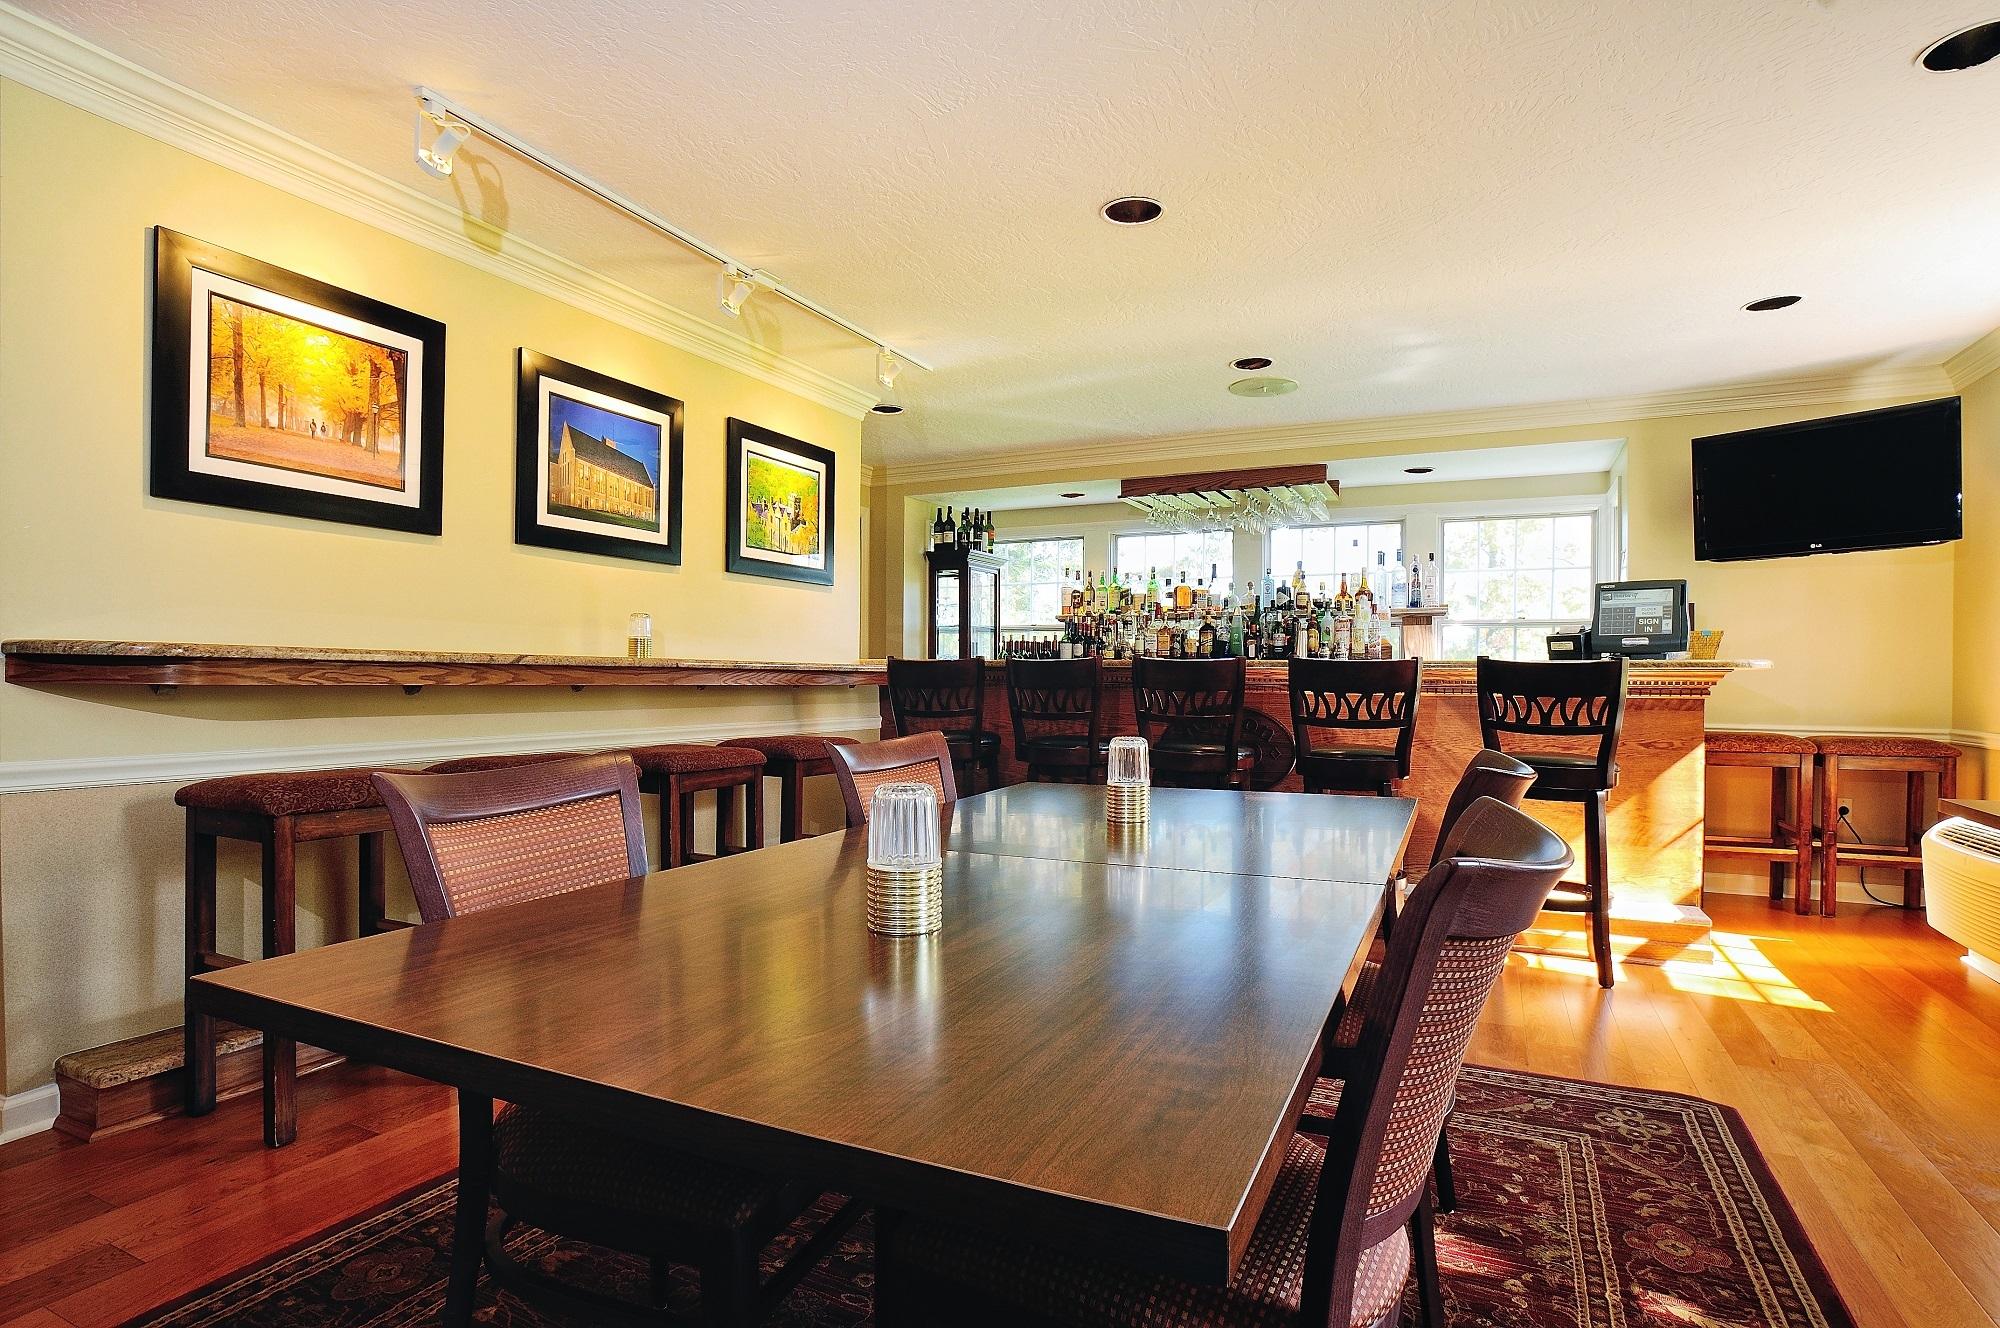 Kenyon Inn & Restaurant image 5